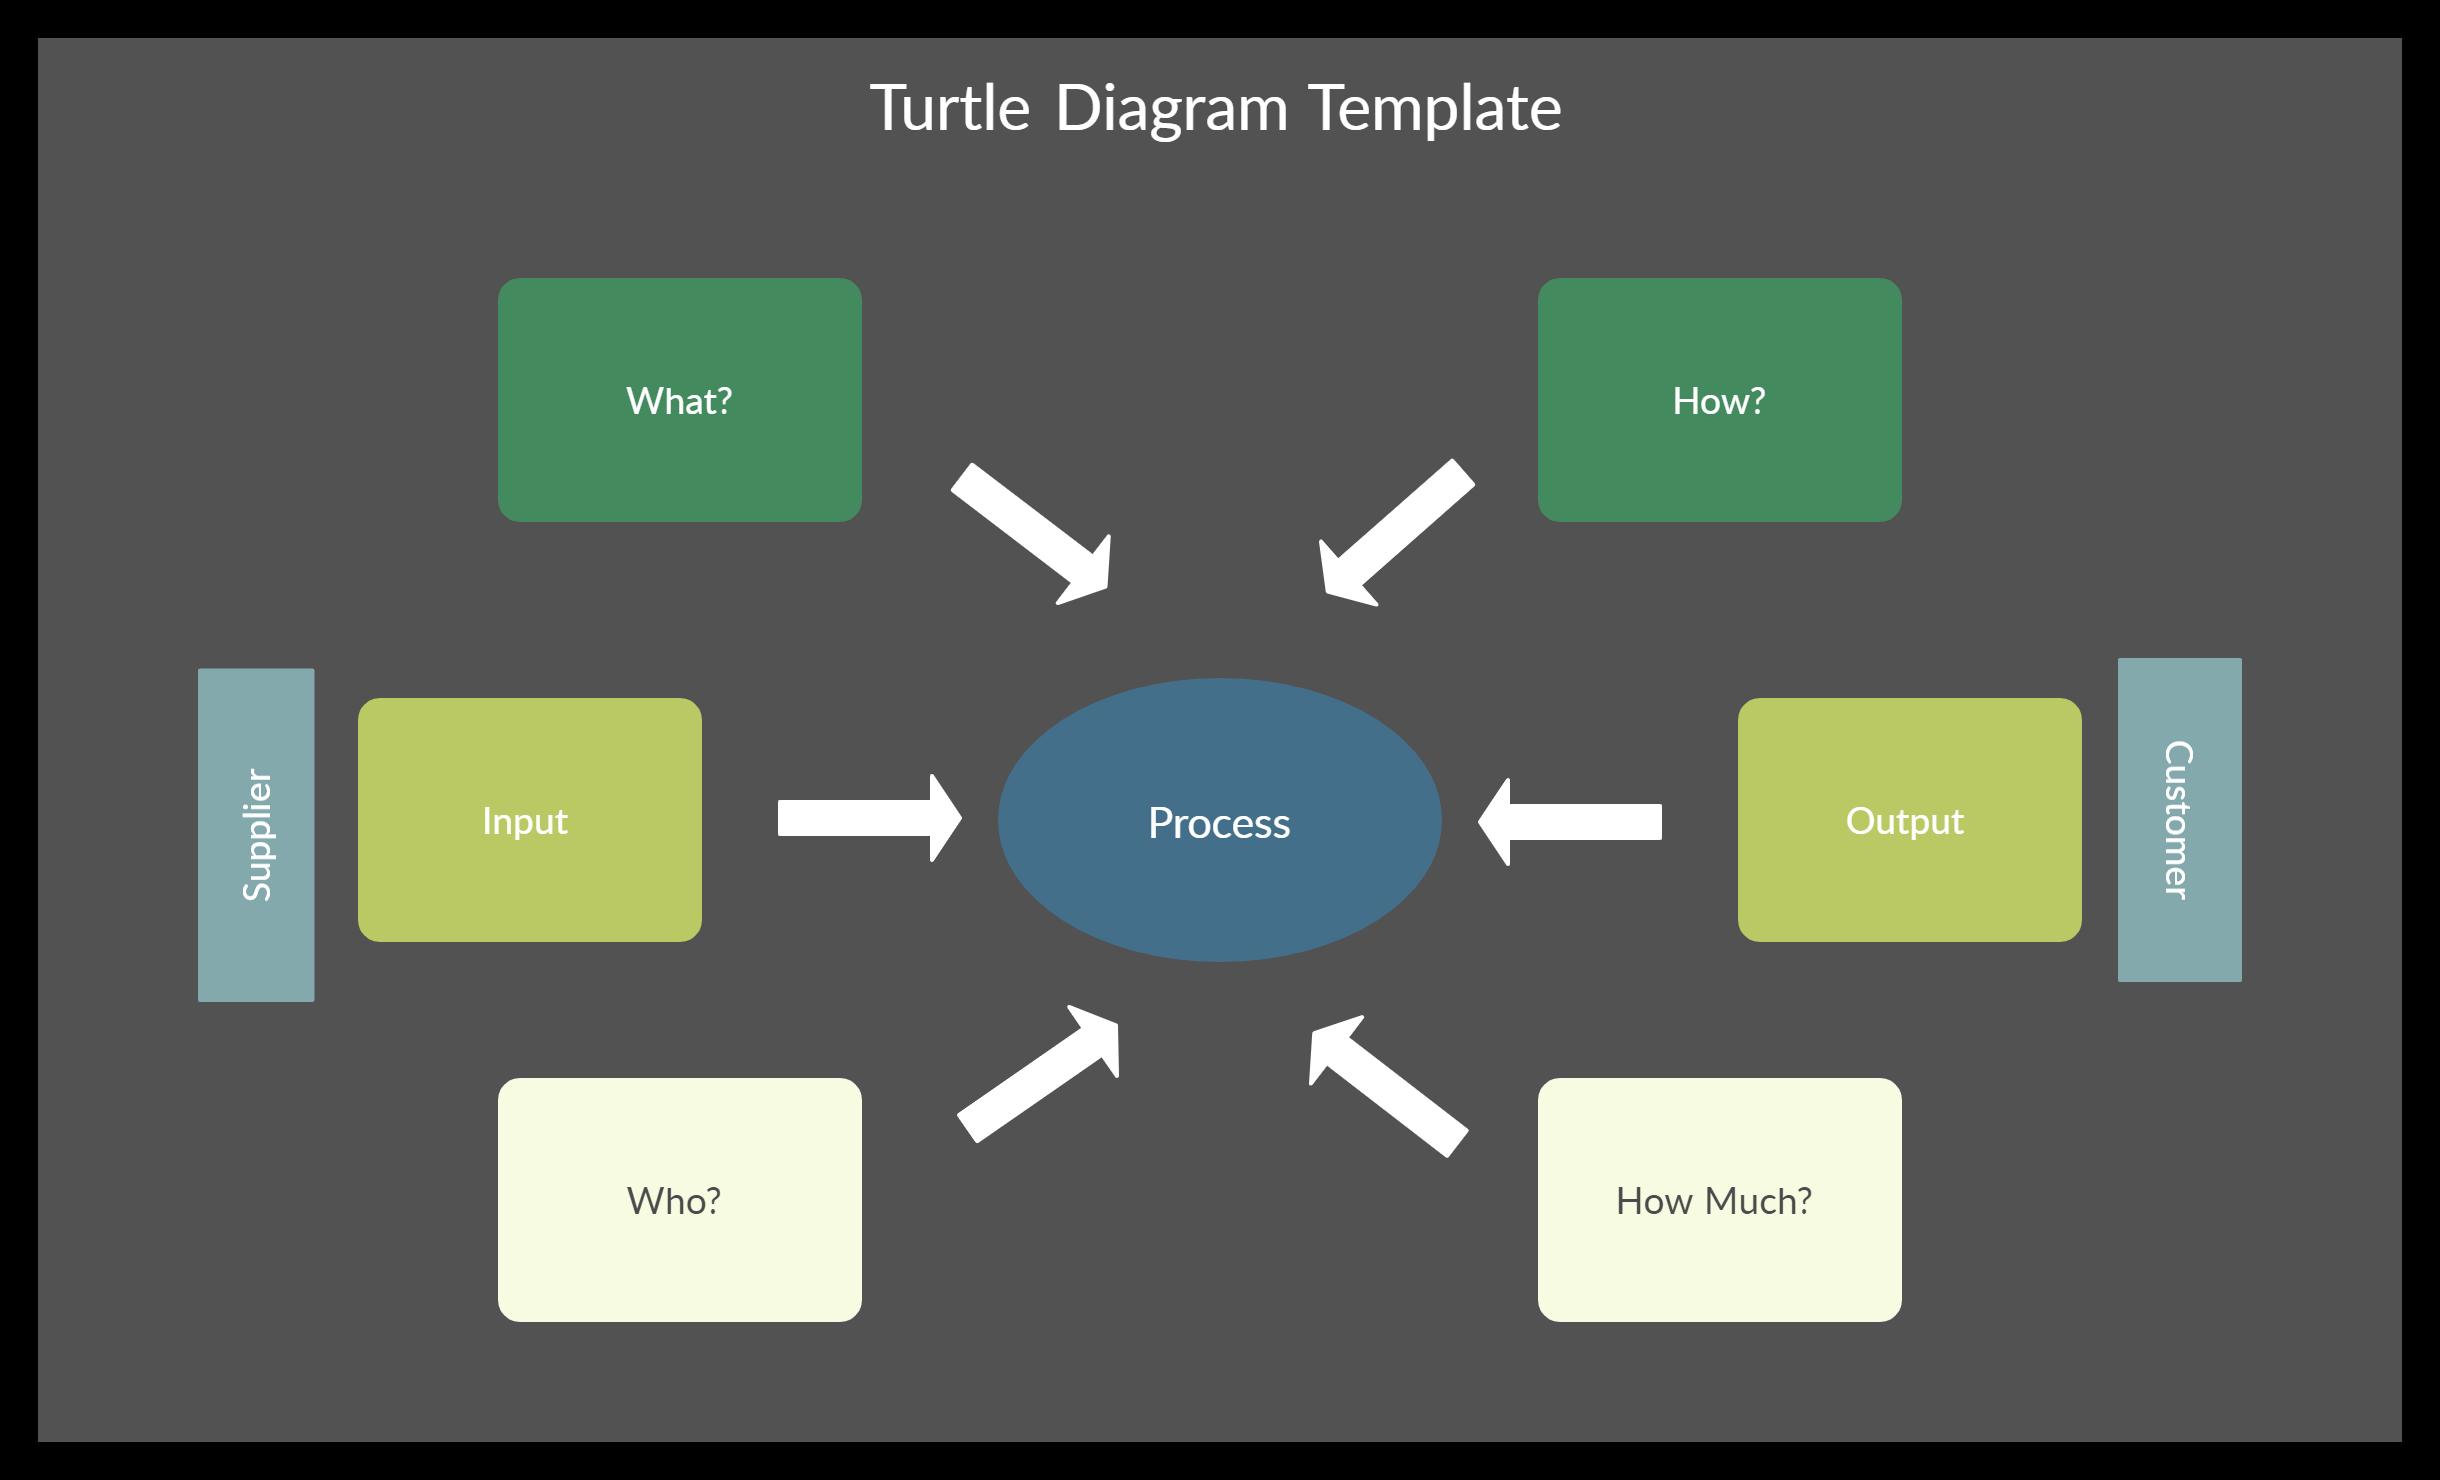 Turtle Diagram Template In 2020 Templates Diagram Interactive